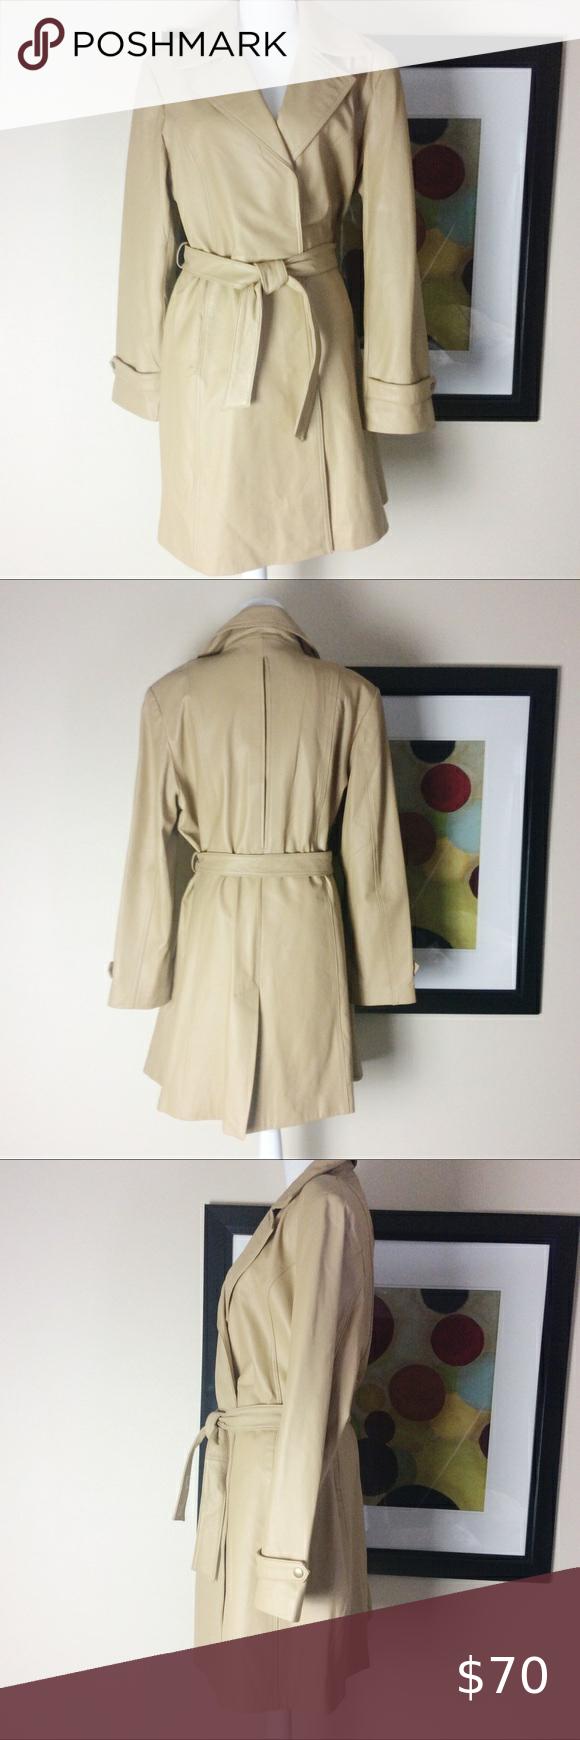 Nwot Leather Gorgeous Coat Centigrade Xl Leather Coat Coat Clothes Design [ 1740 x 580 Pixel ]